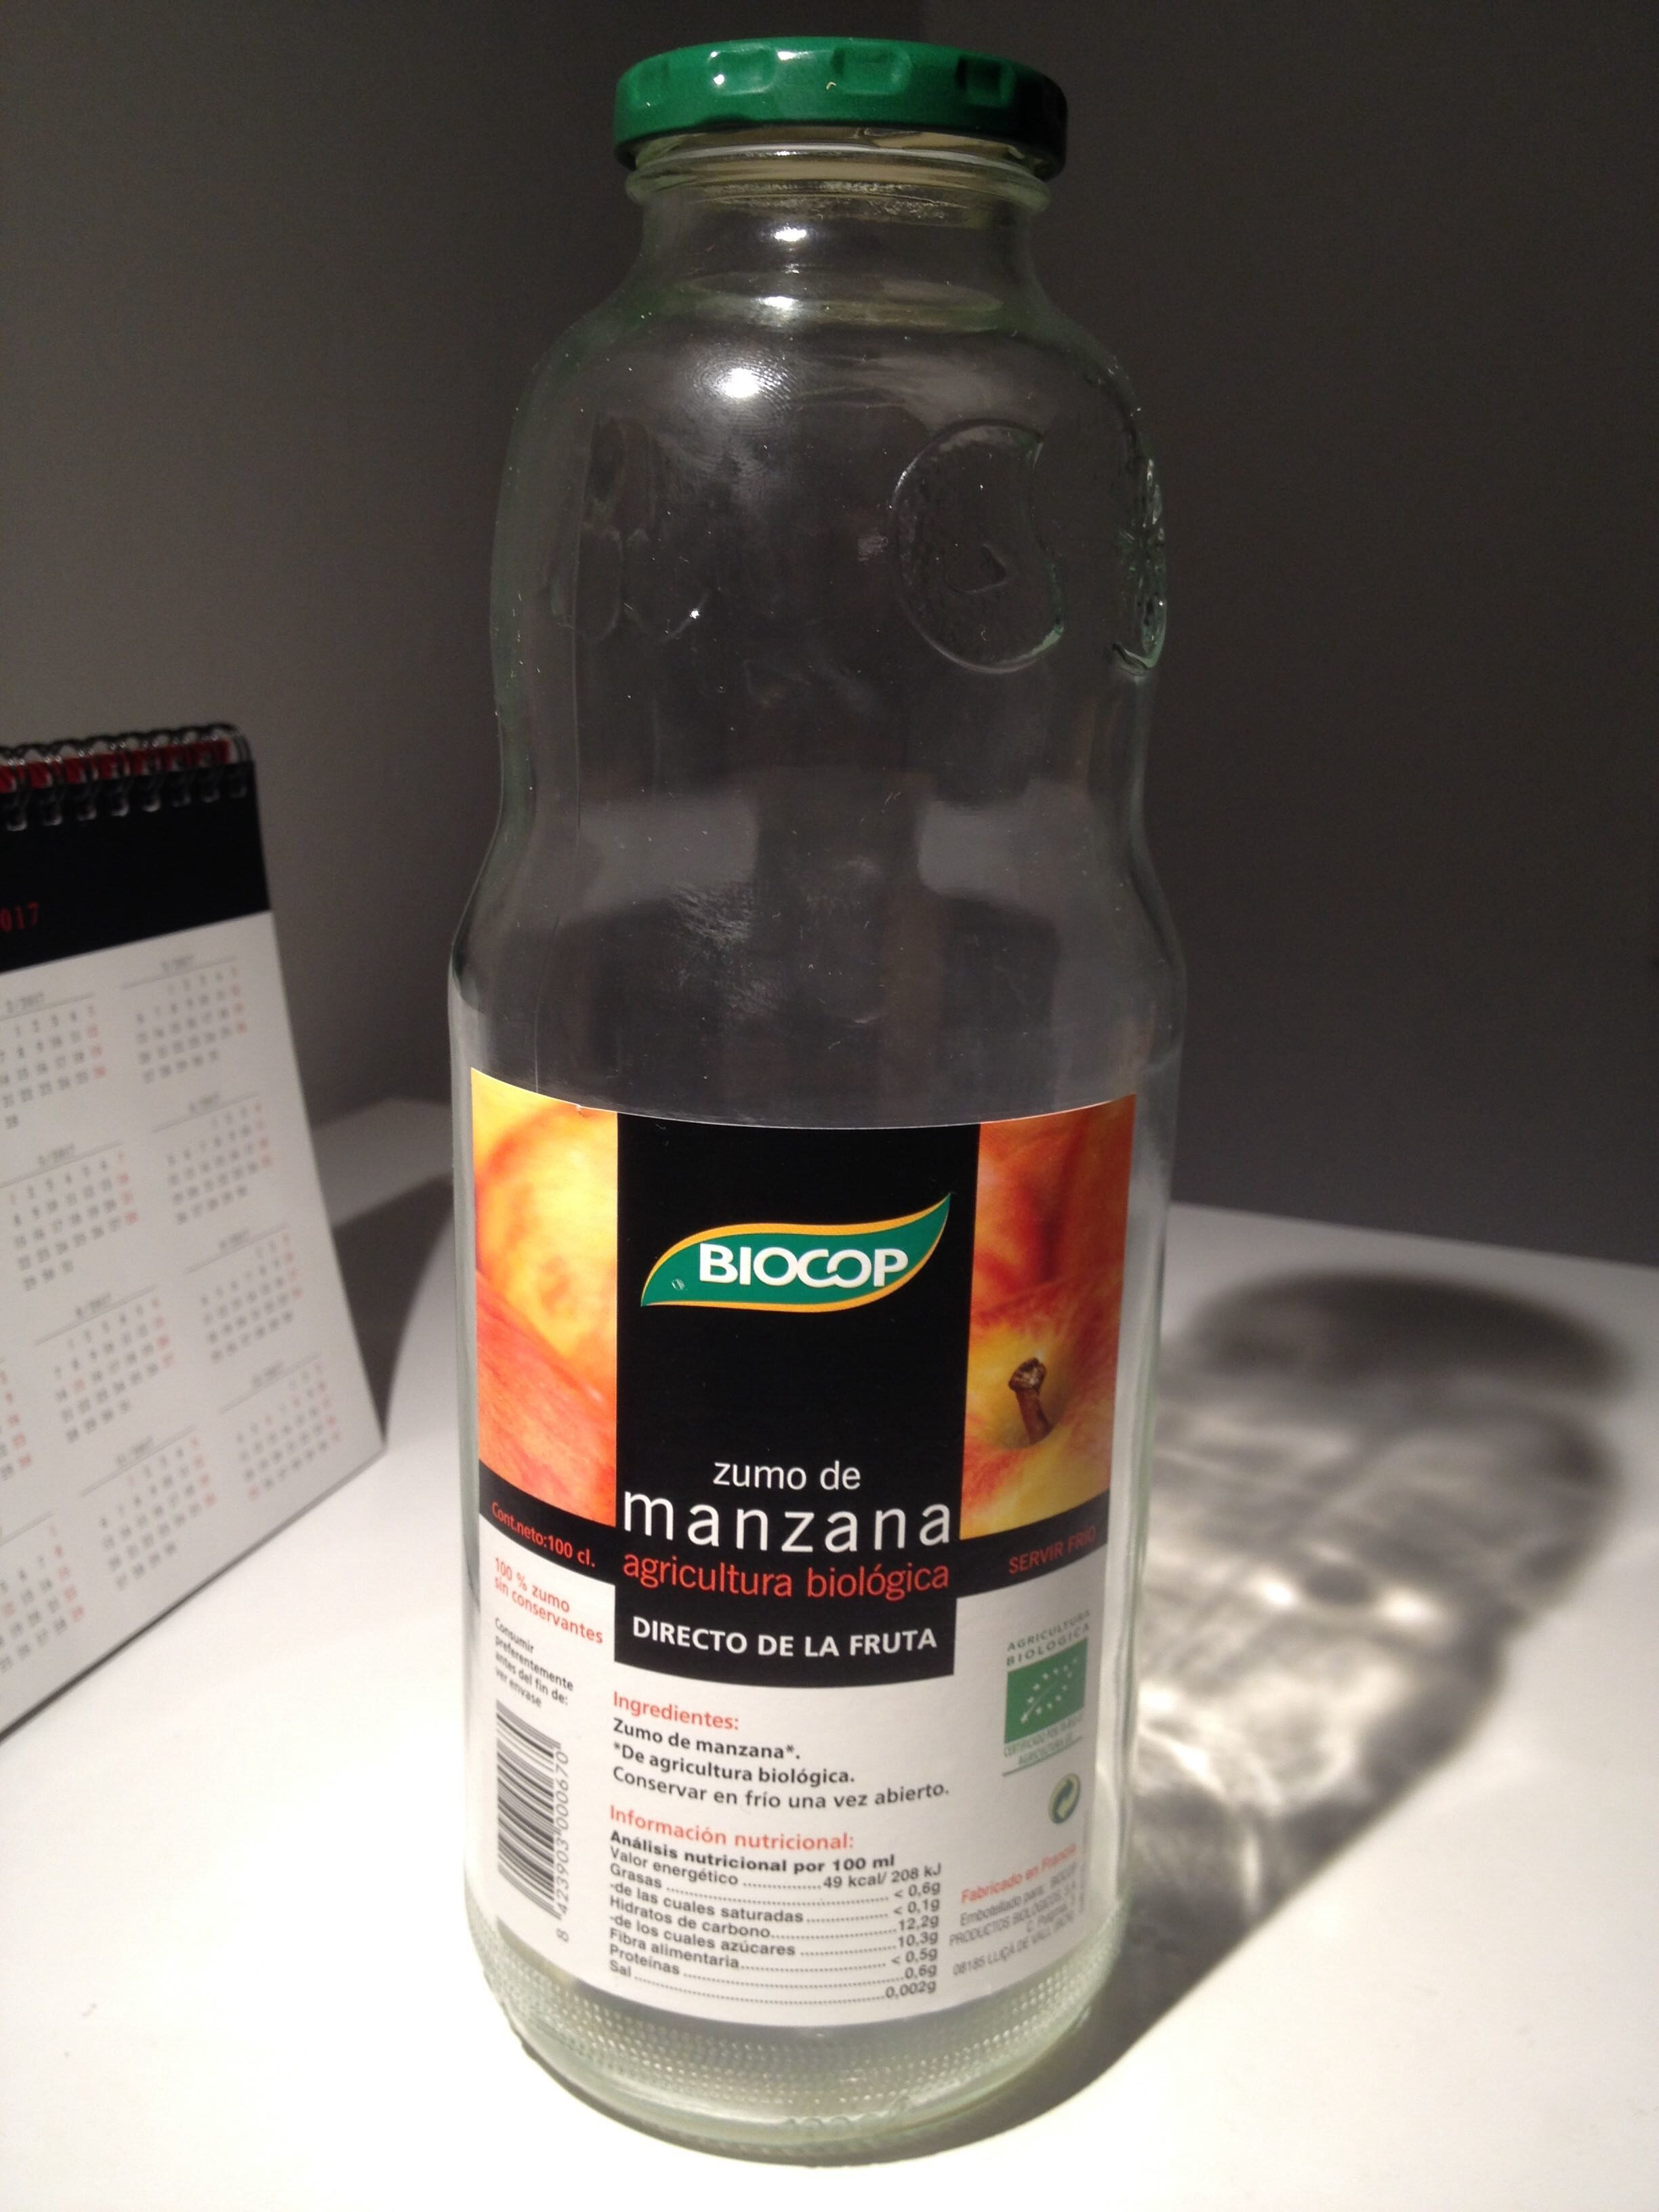 Zumo de manzana agricultura biológica - Product - es